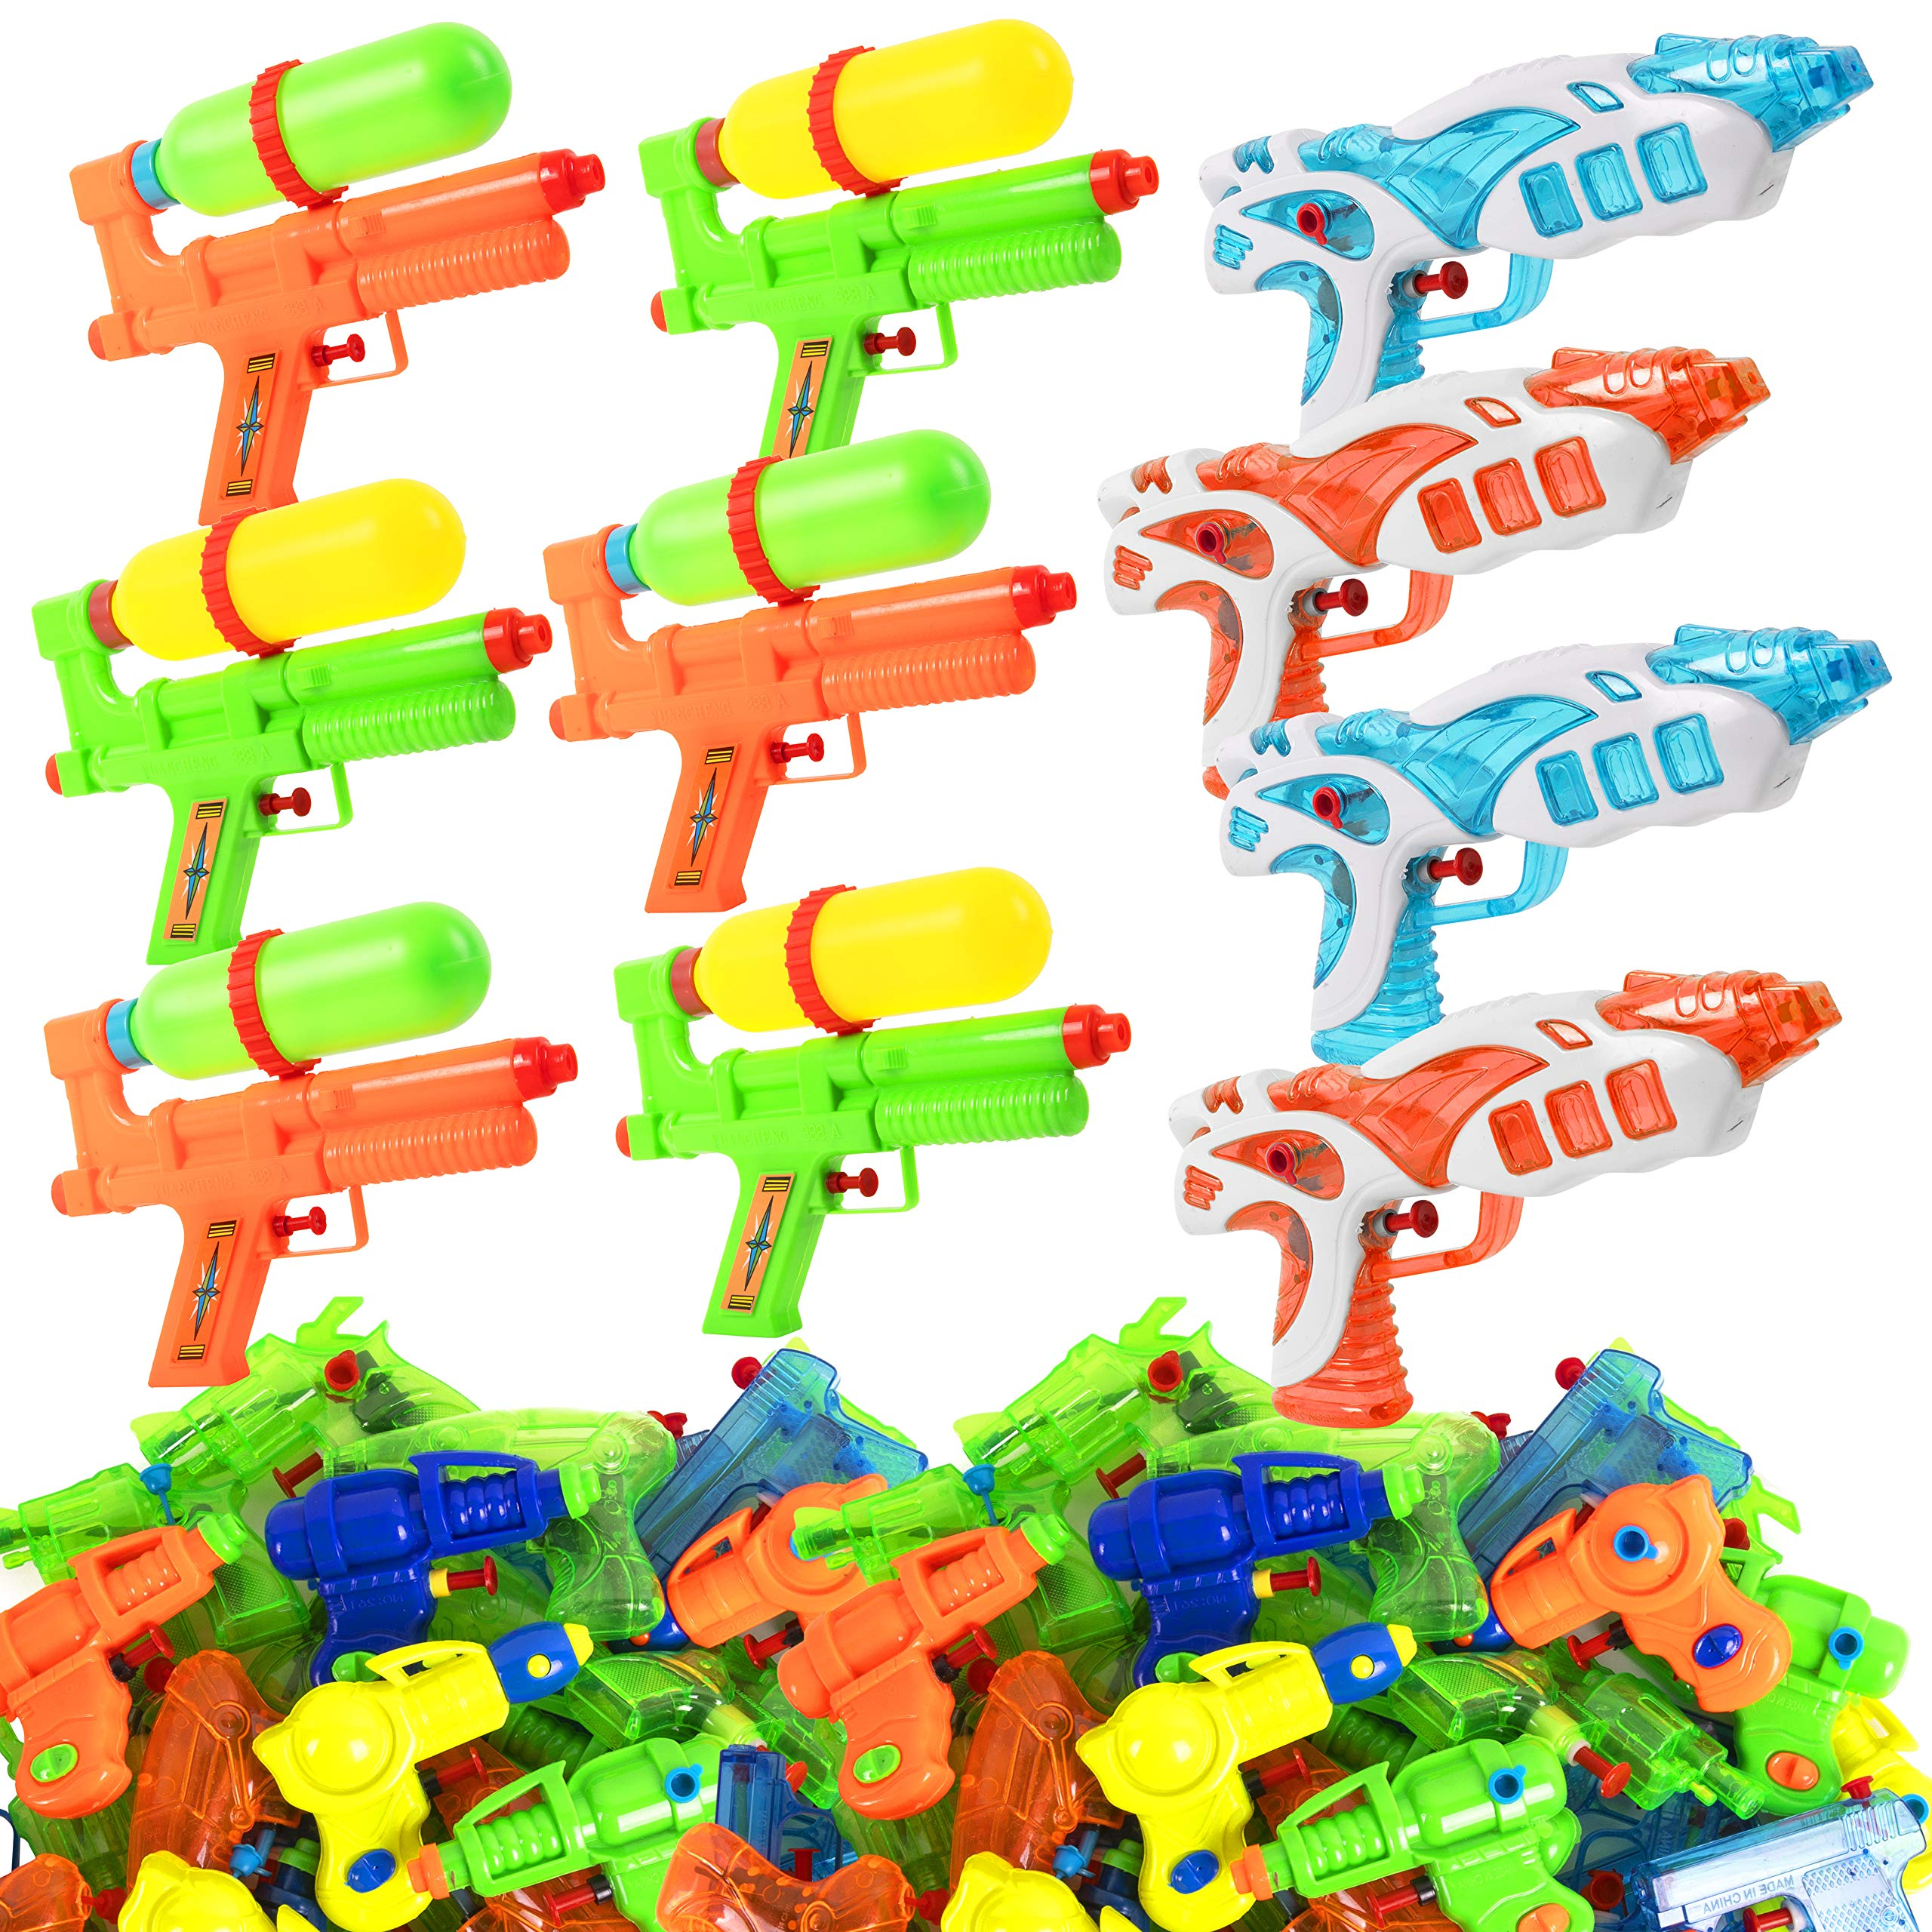 Narwhal Novelties Water Gun (50-Pack) Squirt Gun Assortment; Water Guns for Kids & Squirt Guns for Kids by Narwhal Novelties